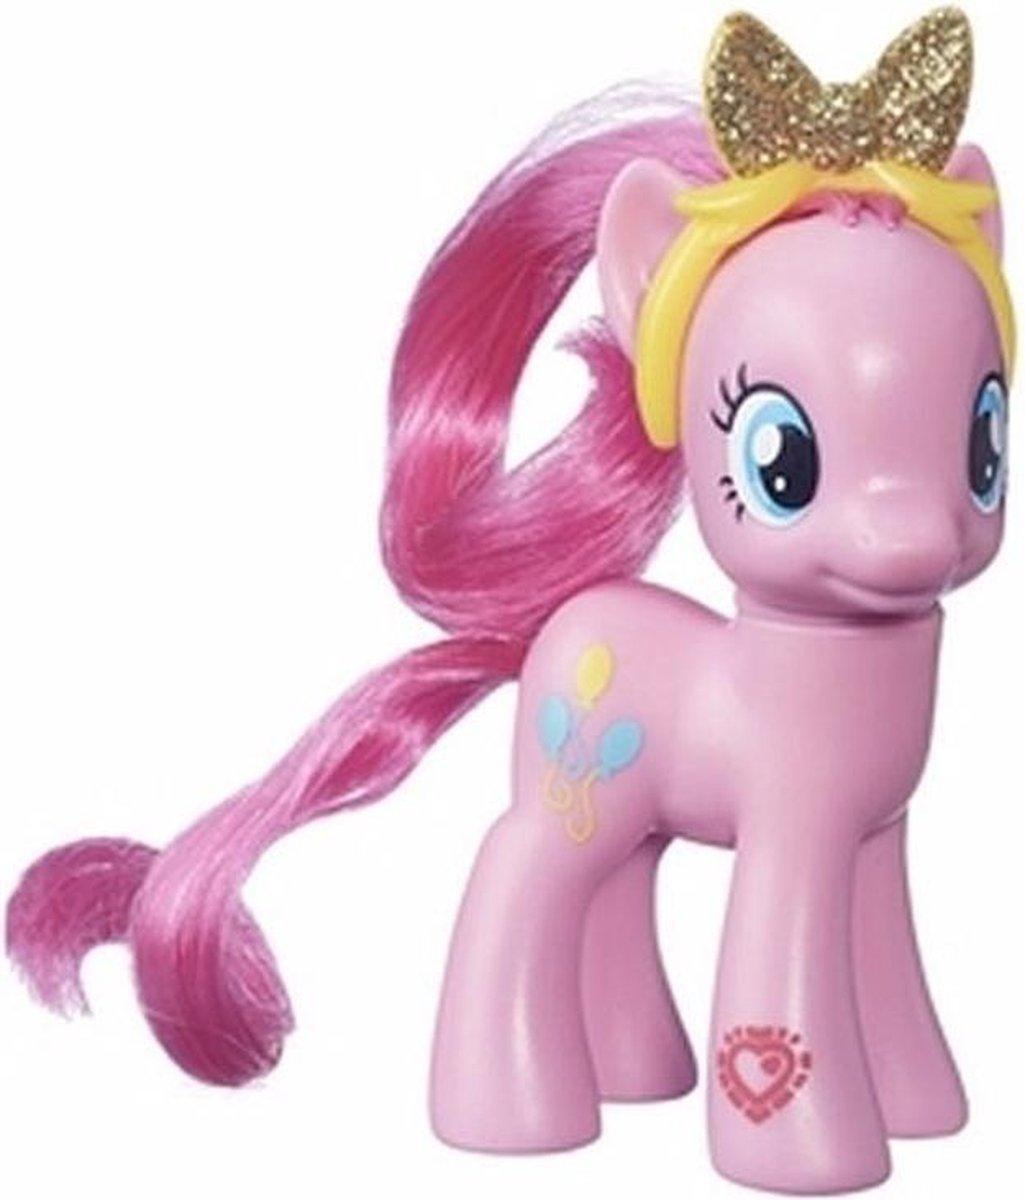 My Little Pony Pinkie Pie speelfiguur 8 cm - My Little Pony